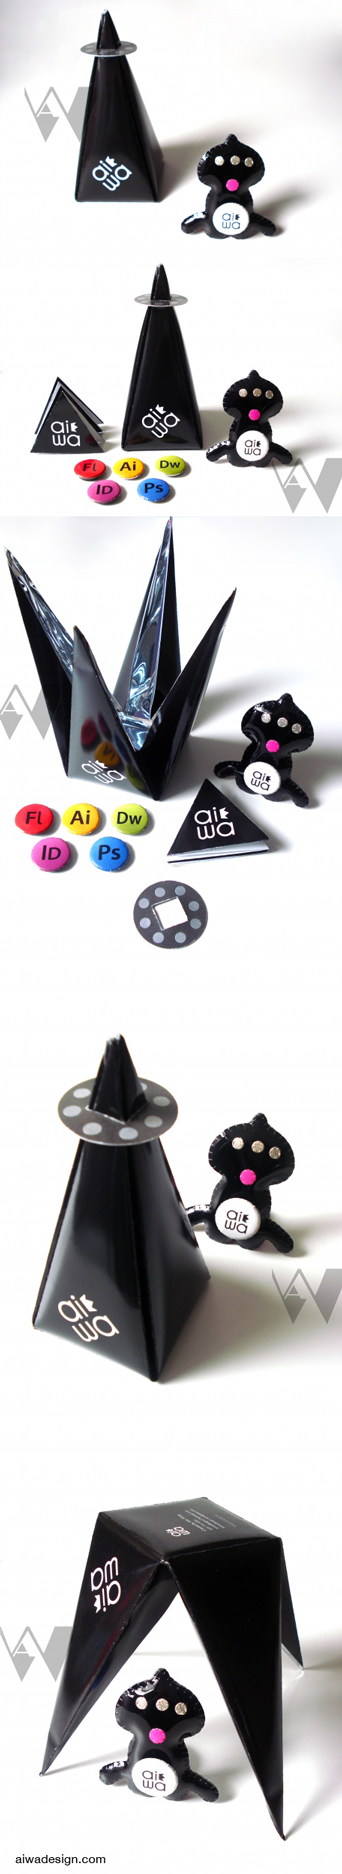 alien aiwa packaging by aiwa-9